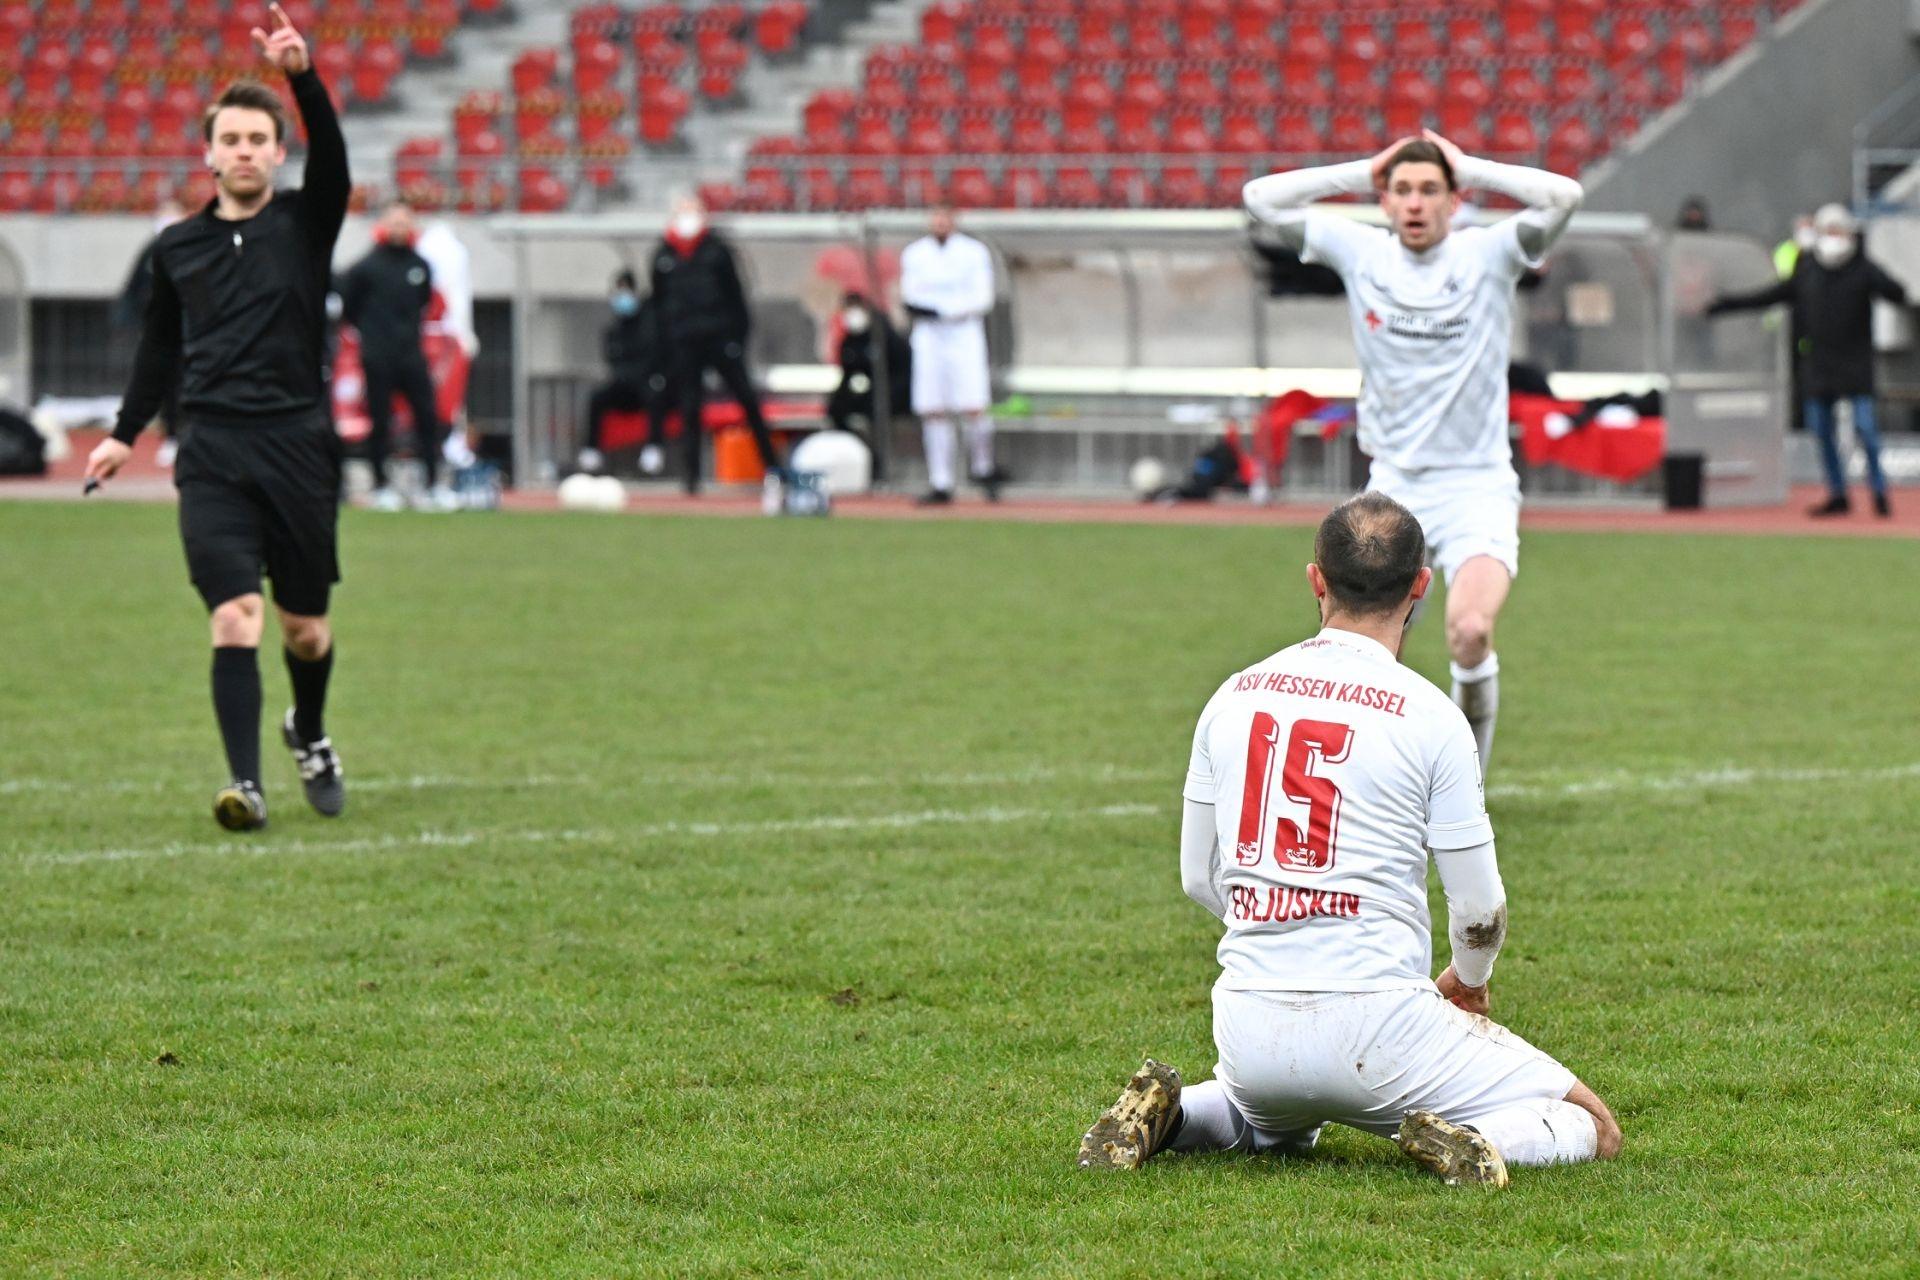 Regionalliga S�dwest 2020/21, KSV Hessen Kassel, SG Sonnenhof Grossaspach, Endstand 0:2, Sergej Evljuskin